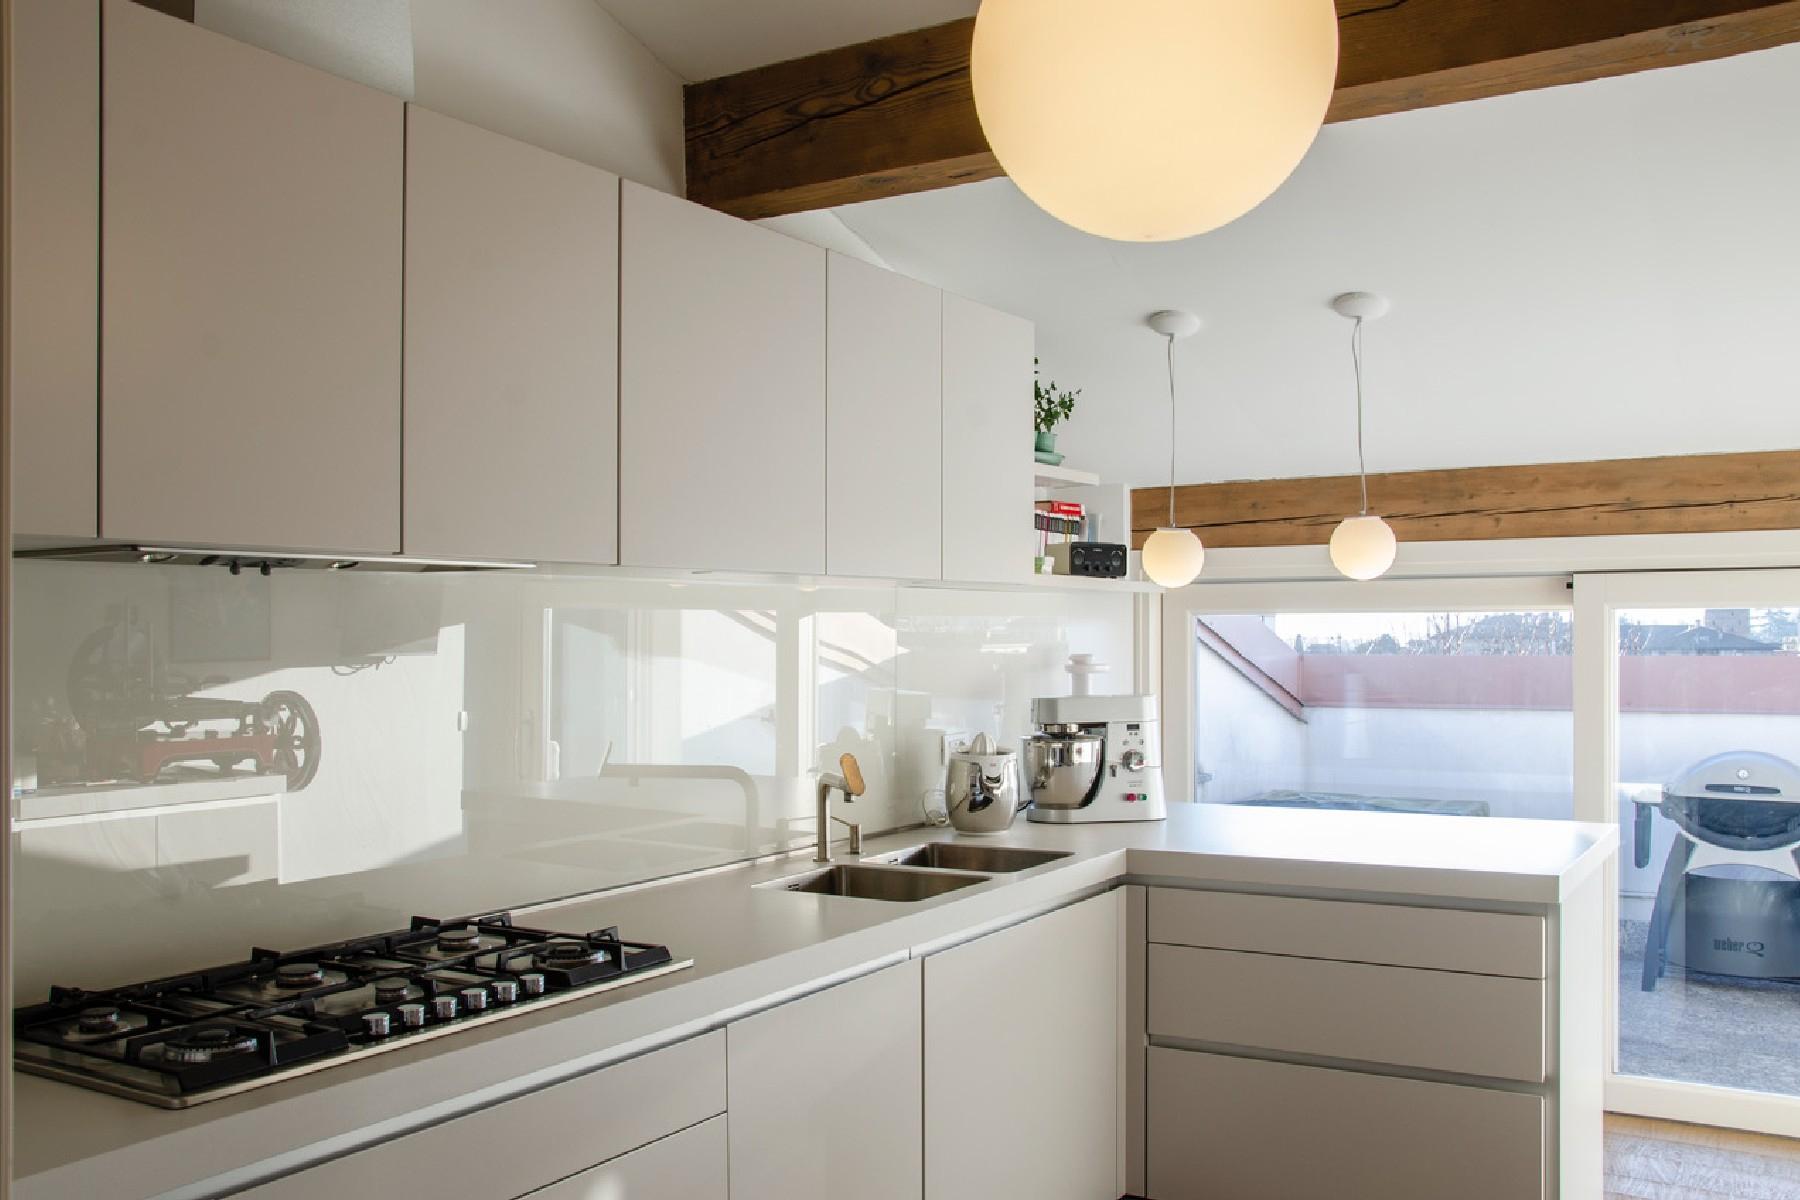 Appartamento in Vendita a Merate: 4 locali, 225 mq - Foto 14